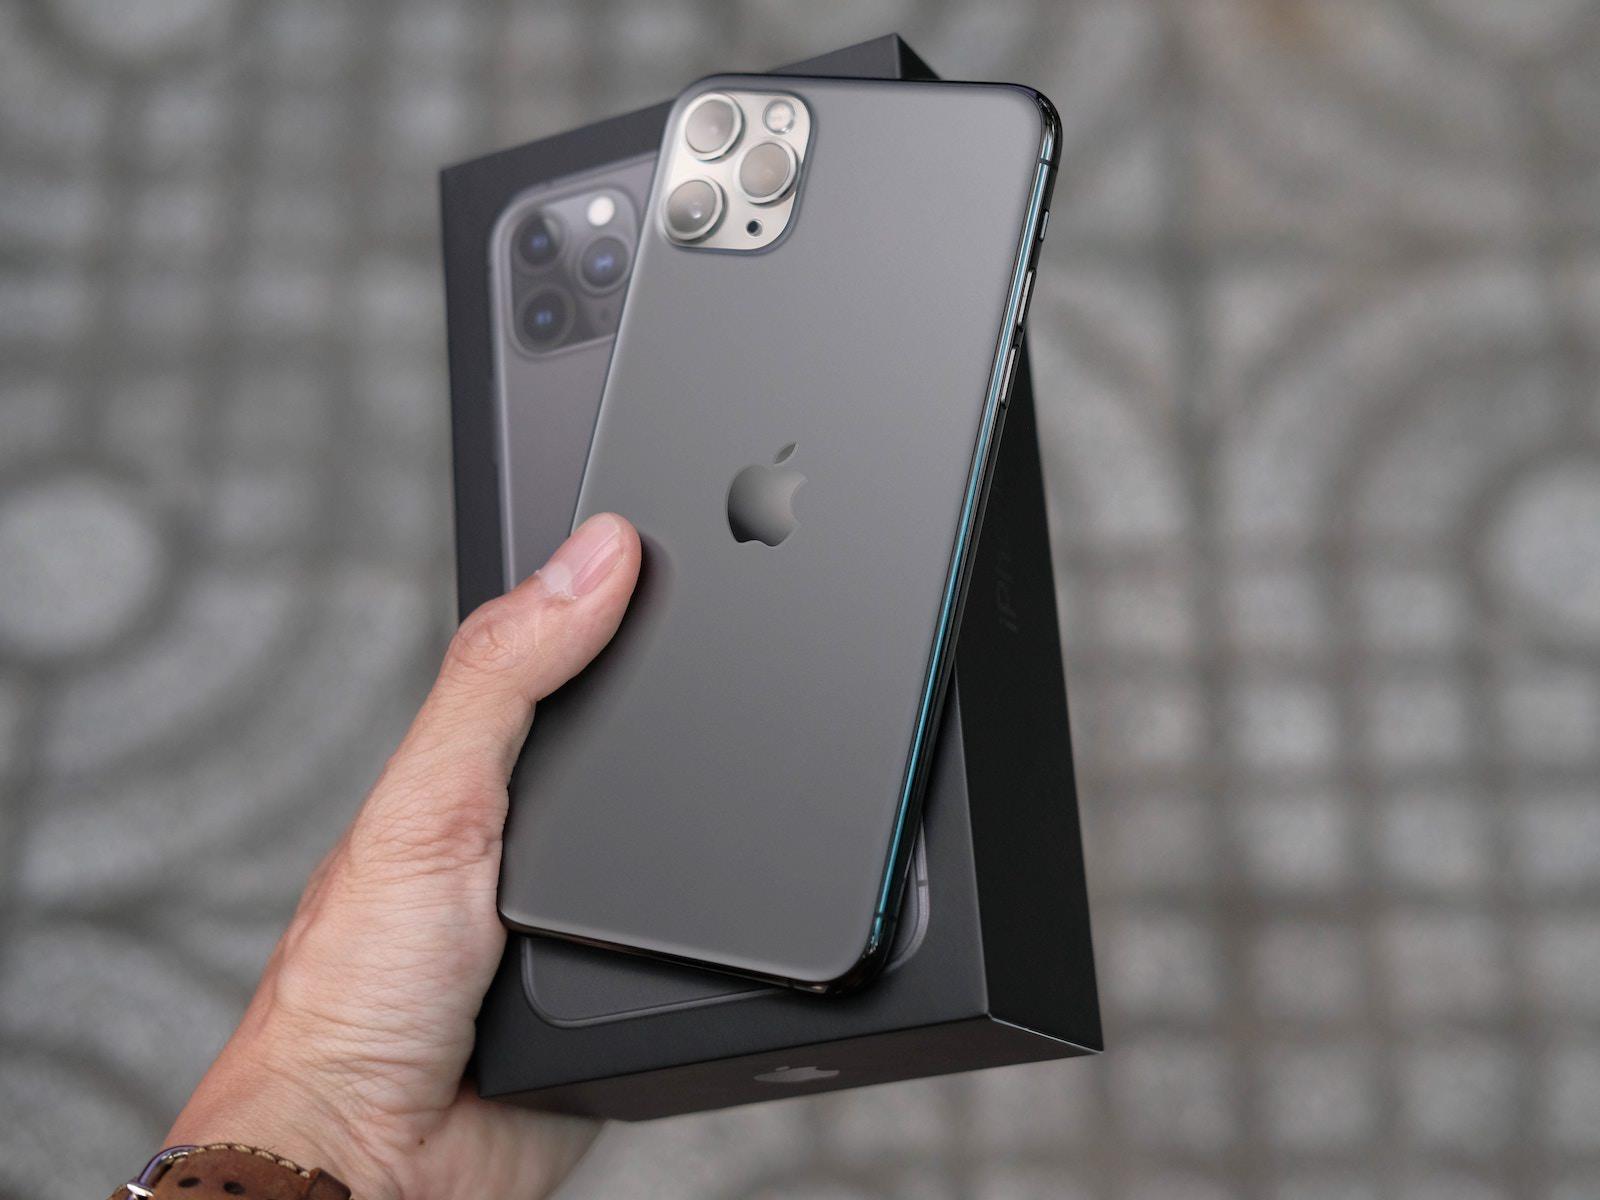 Thai nguyen X5V7hb7CxNY unsplash iphone 11 with box